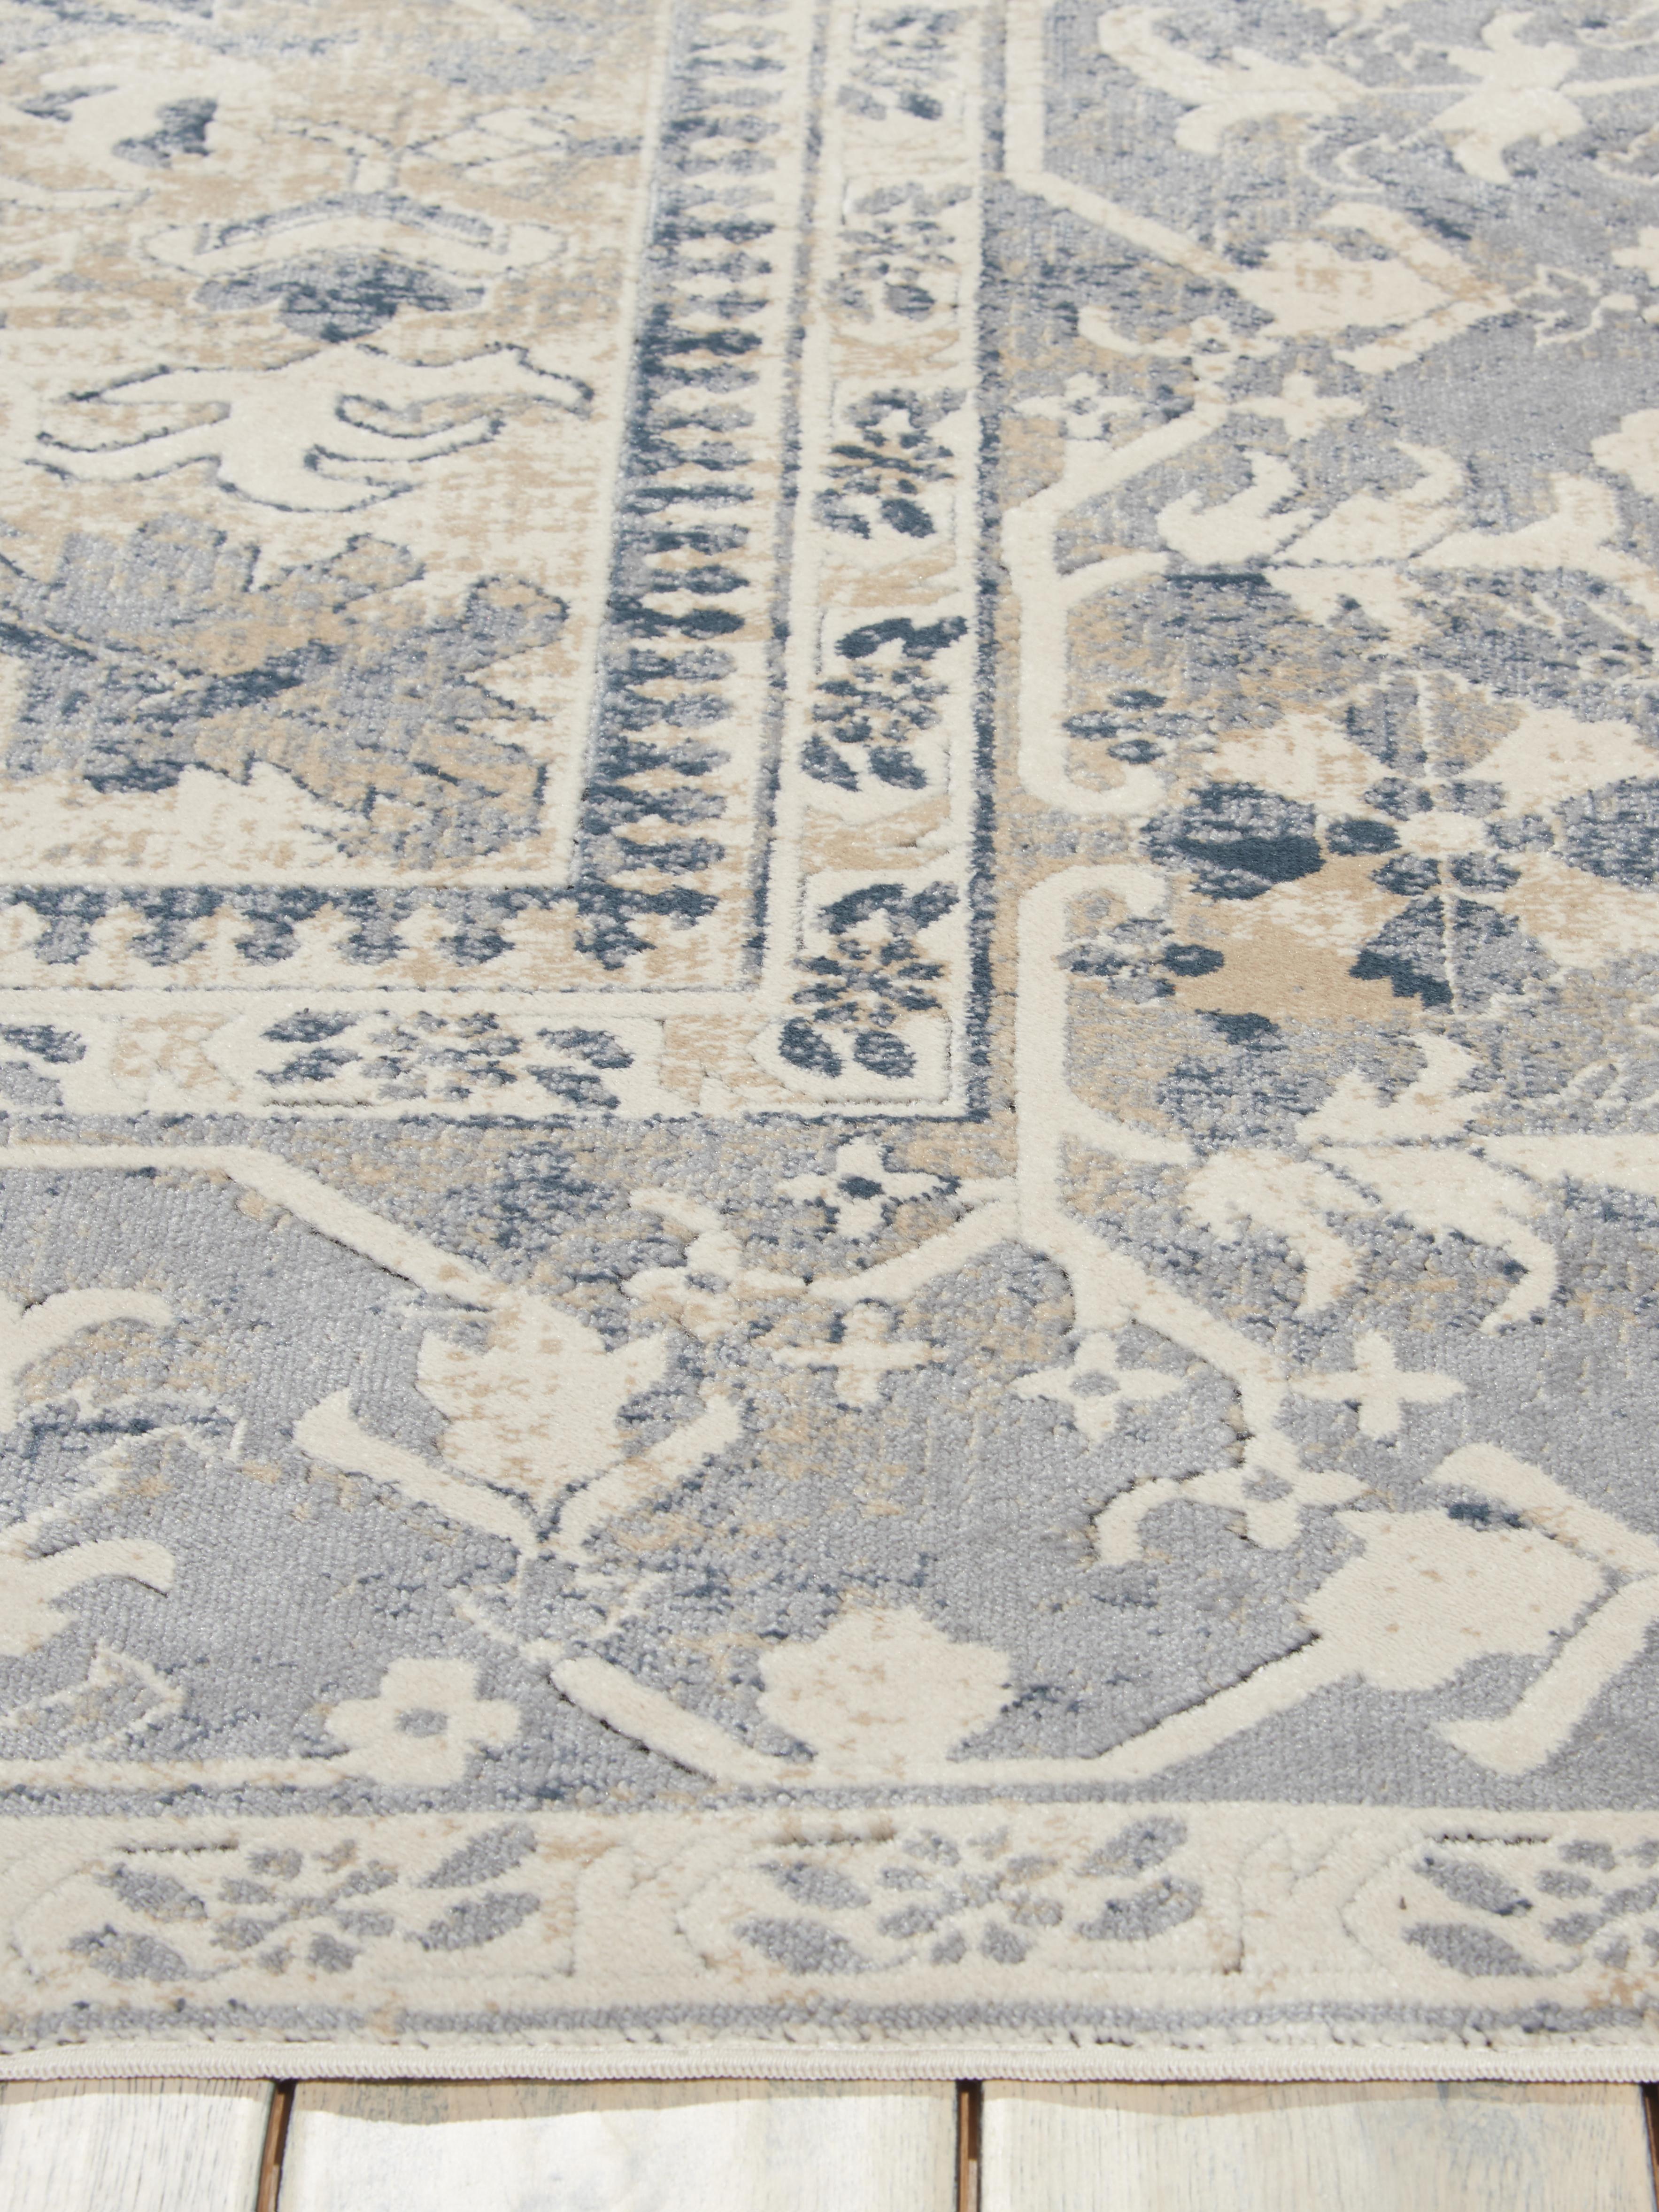 Tapis vintage bleu beige Malta, Blanc ivoire, tons bleus